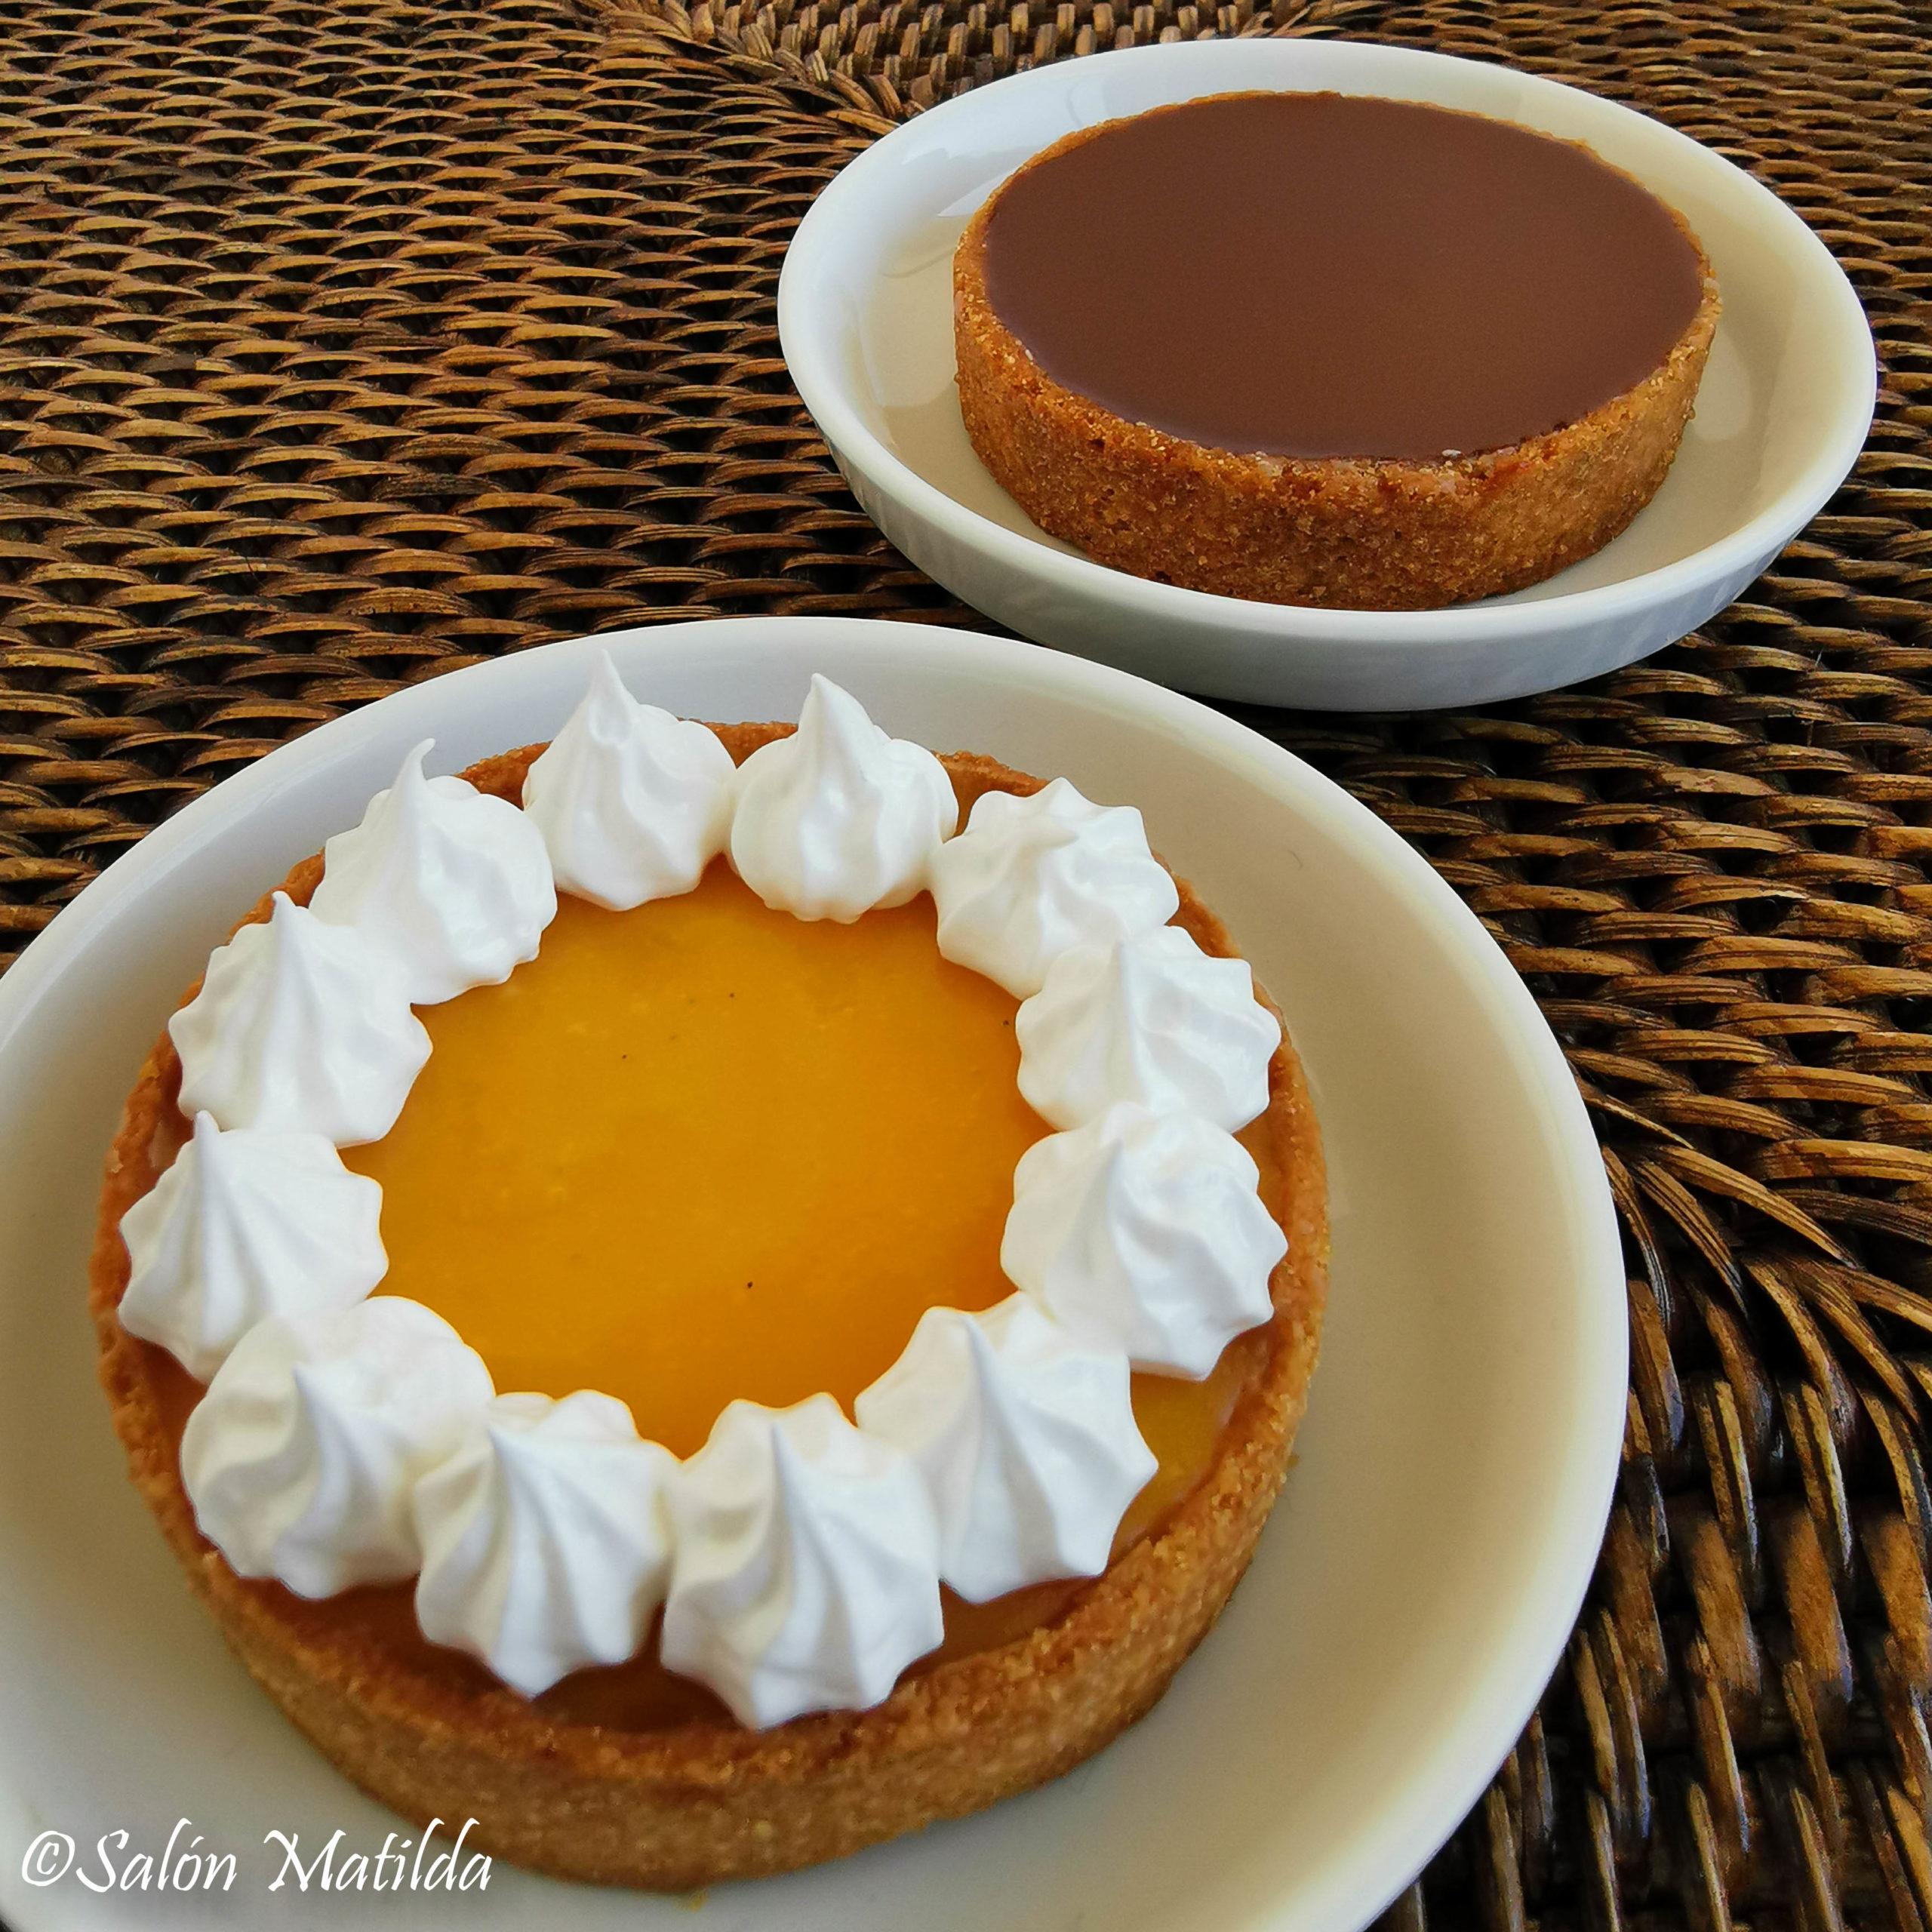 Tartelettes, Passionsfrucht, Schokolade